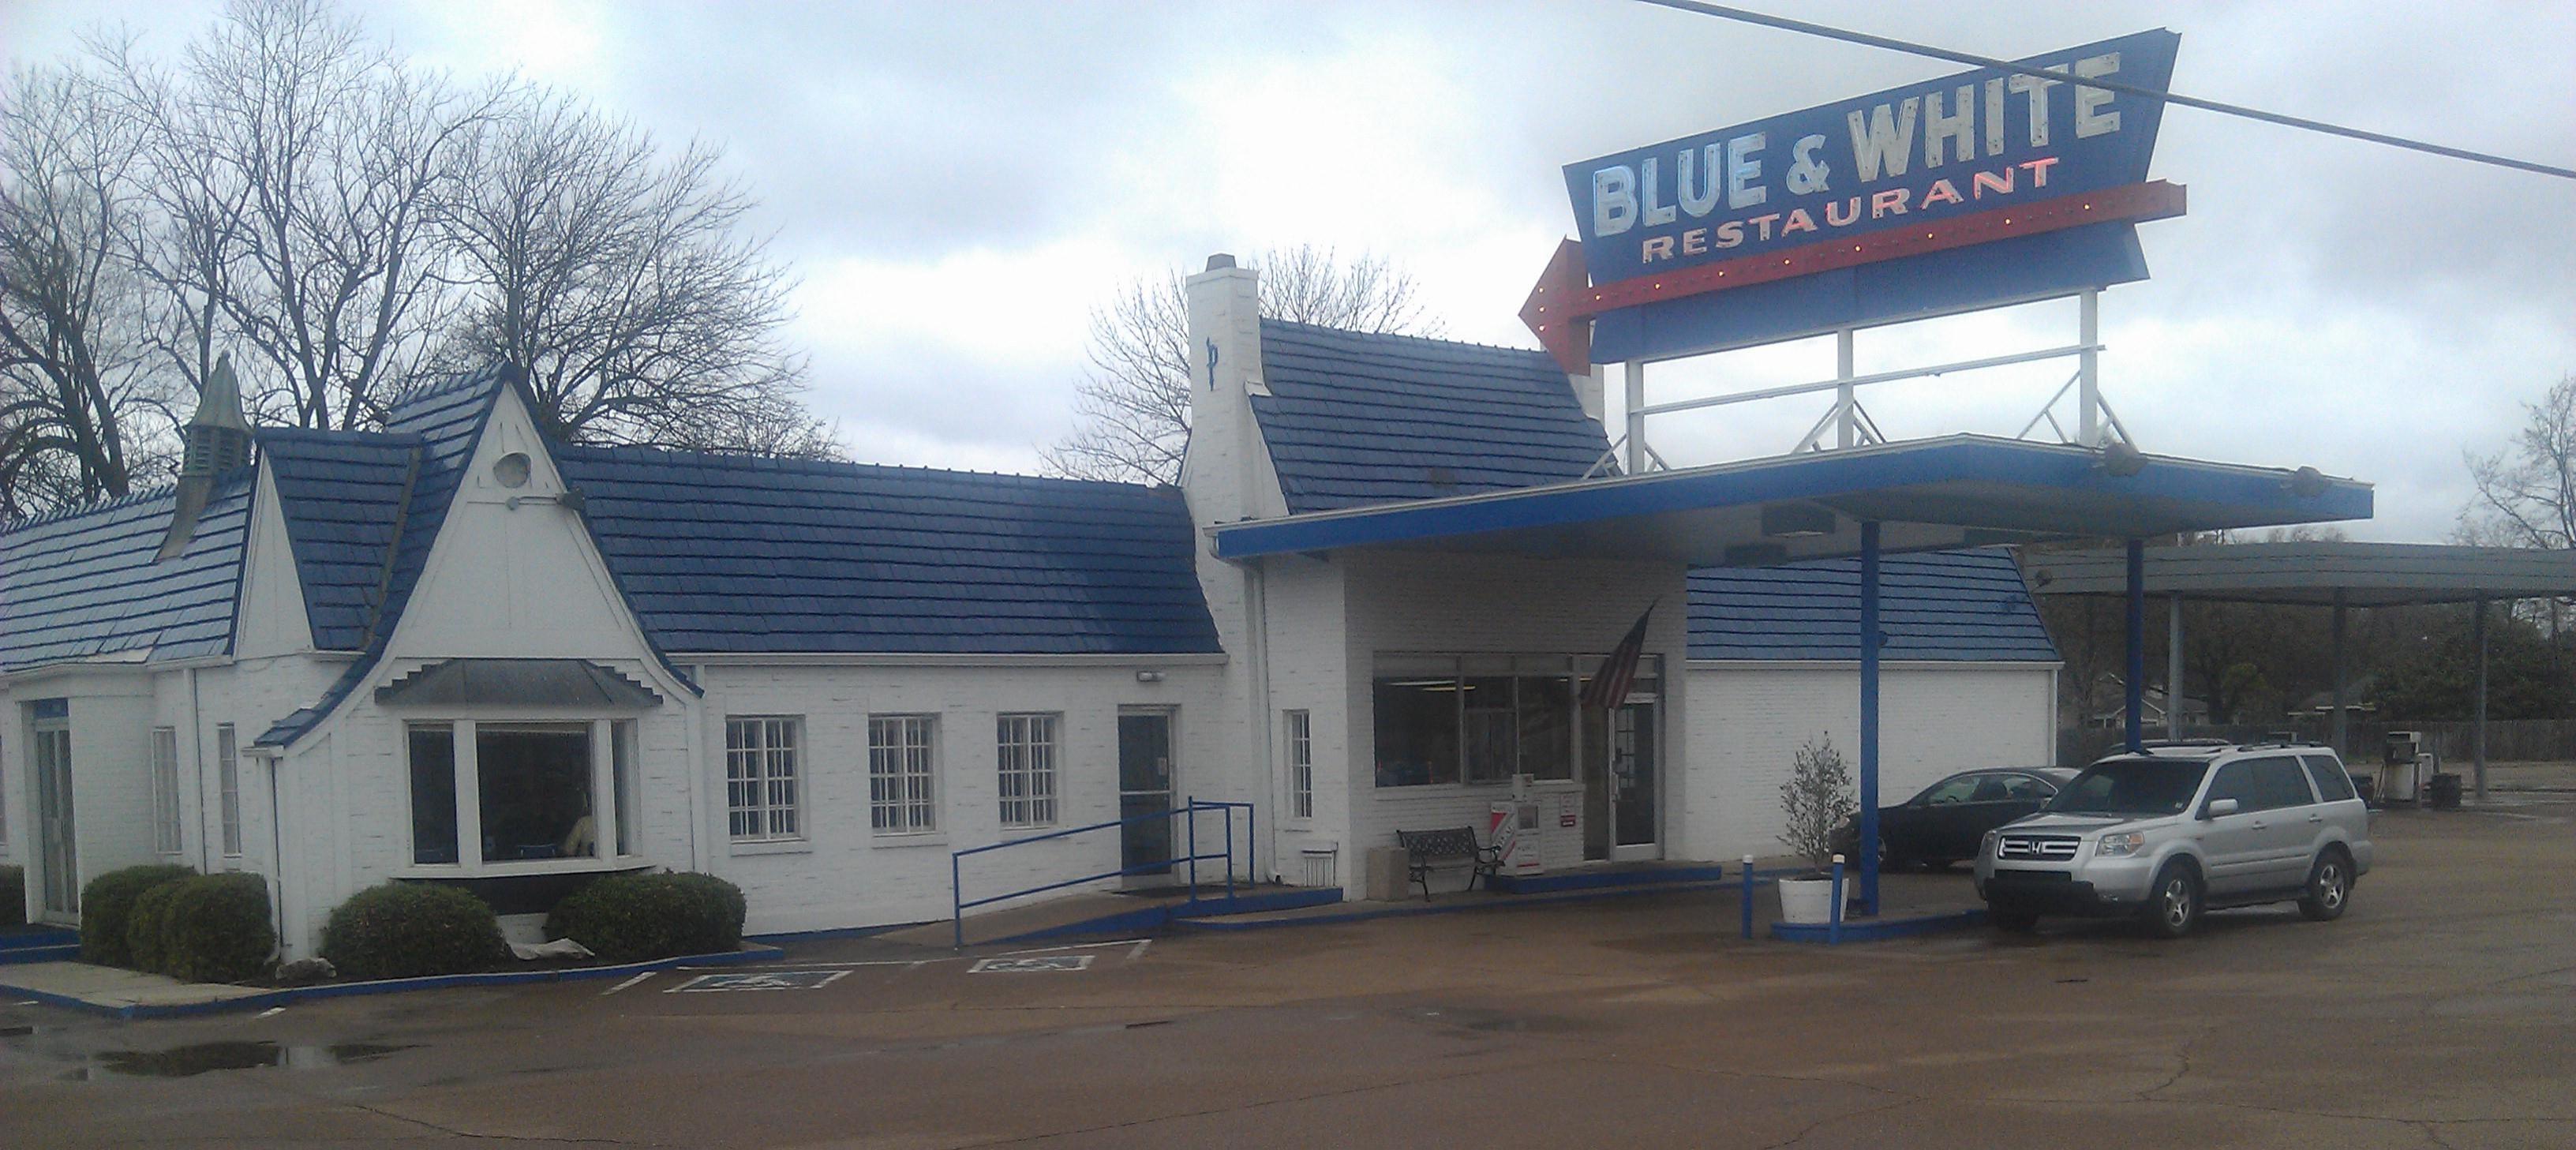 Mississippi tunica county dundee - Mississippi Restaurant Tunica Us61 Tunicacounty Blueandwhiterestaurant